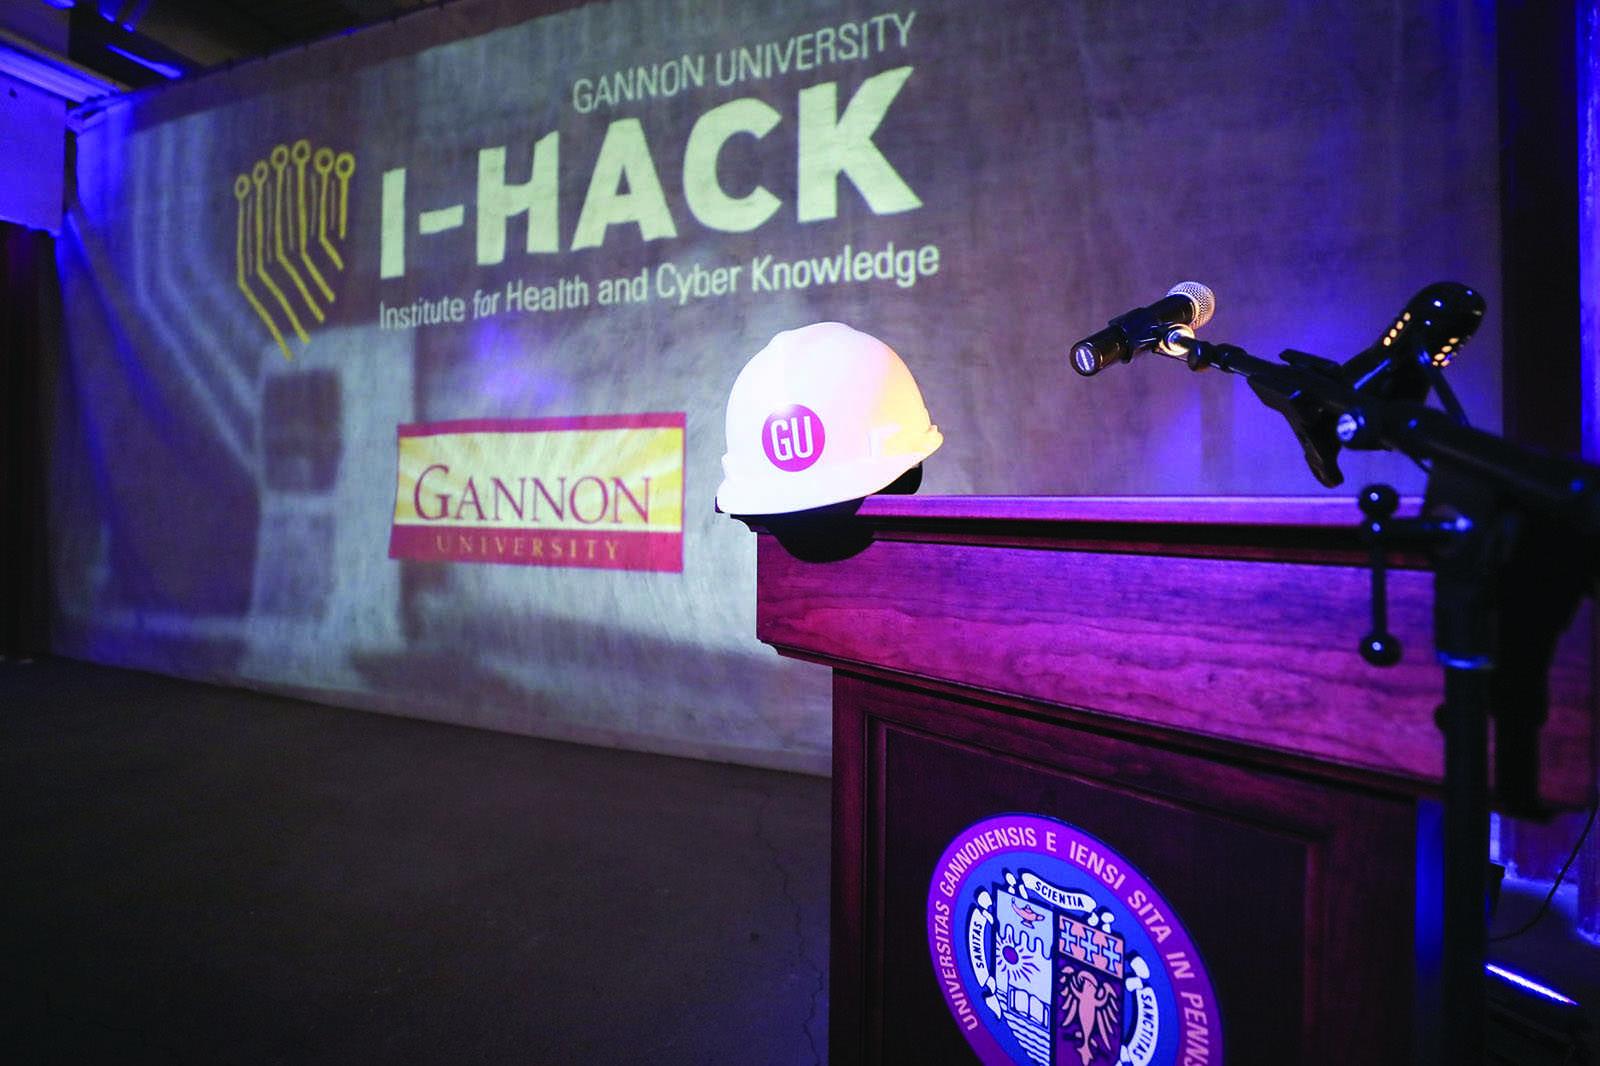 Gannon partnership to help shape I-HACK program